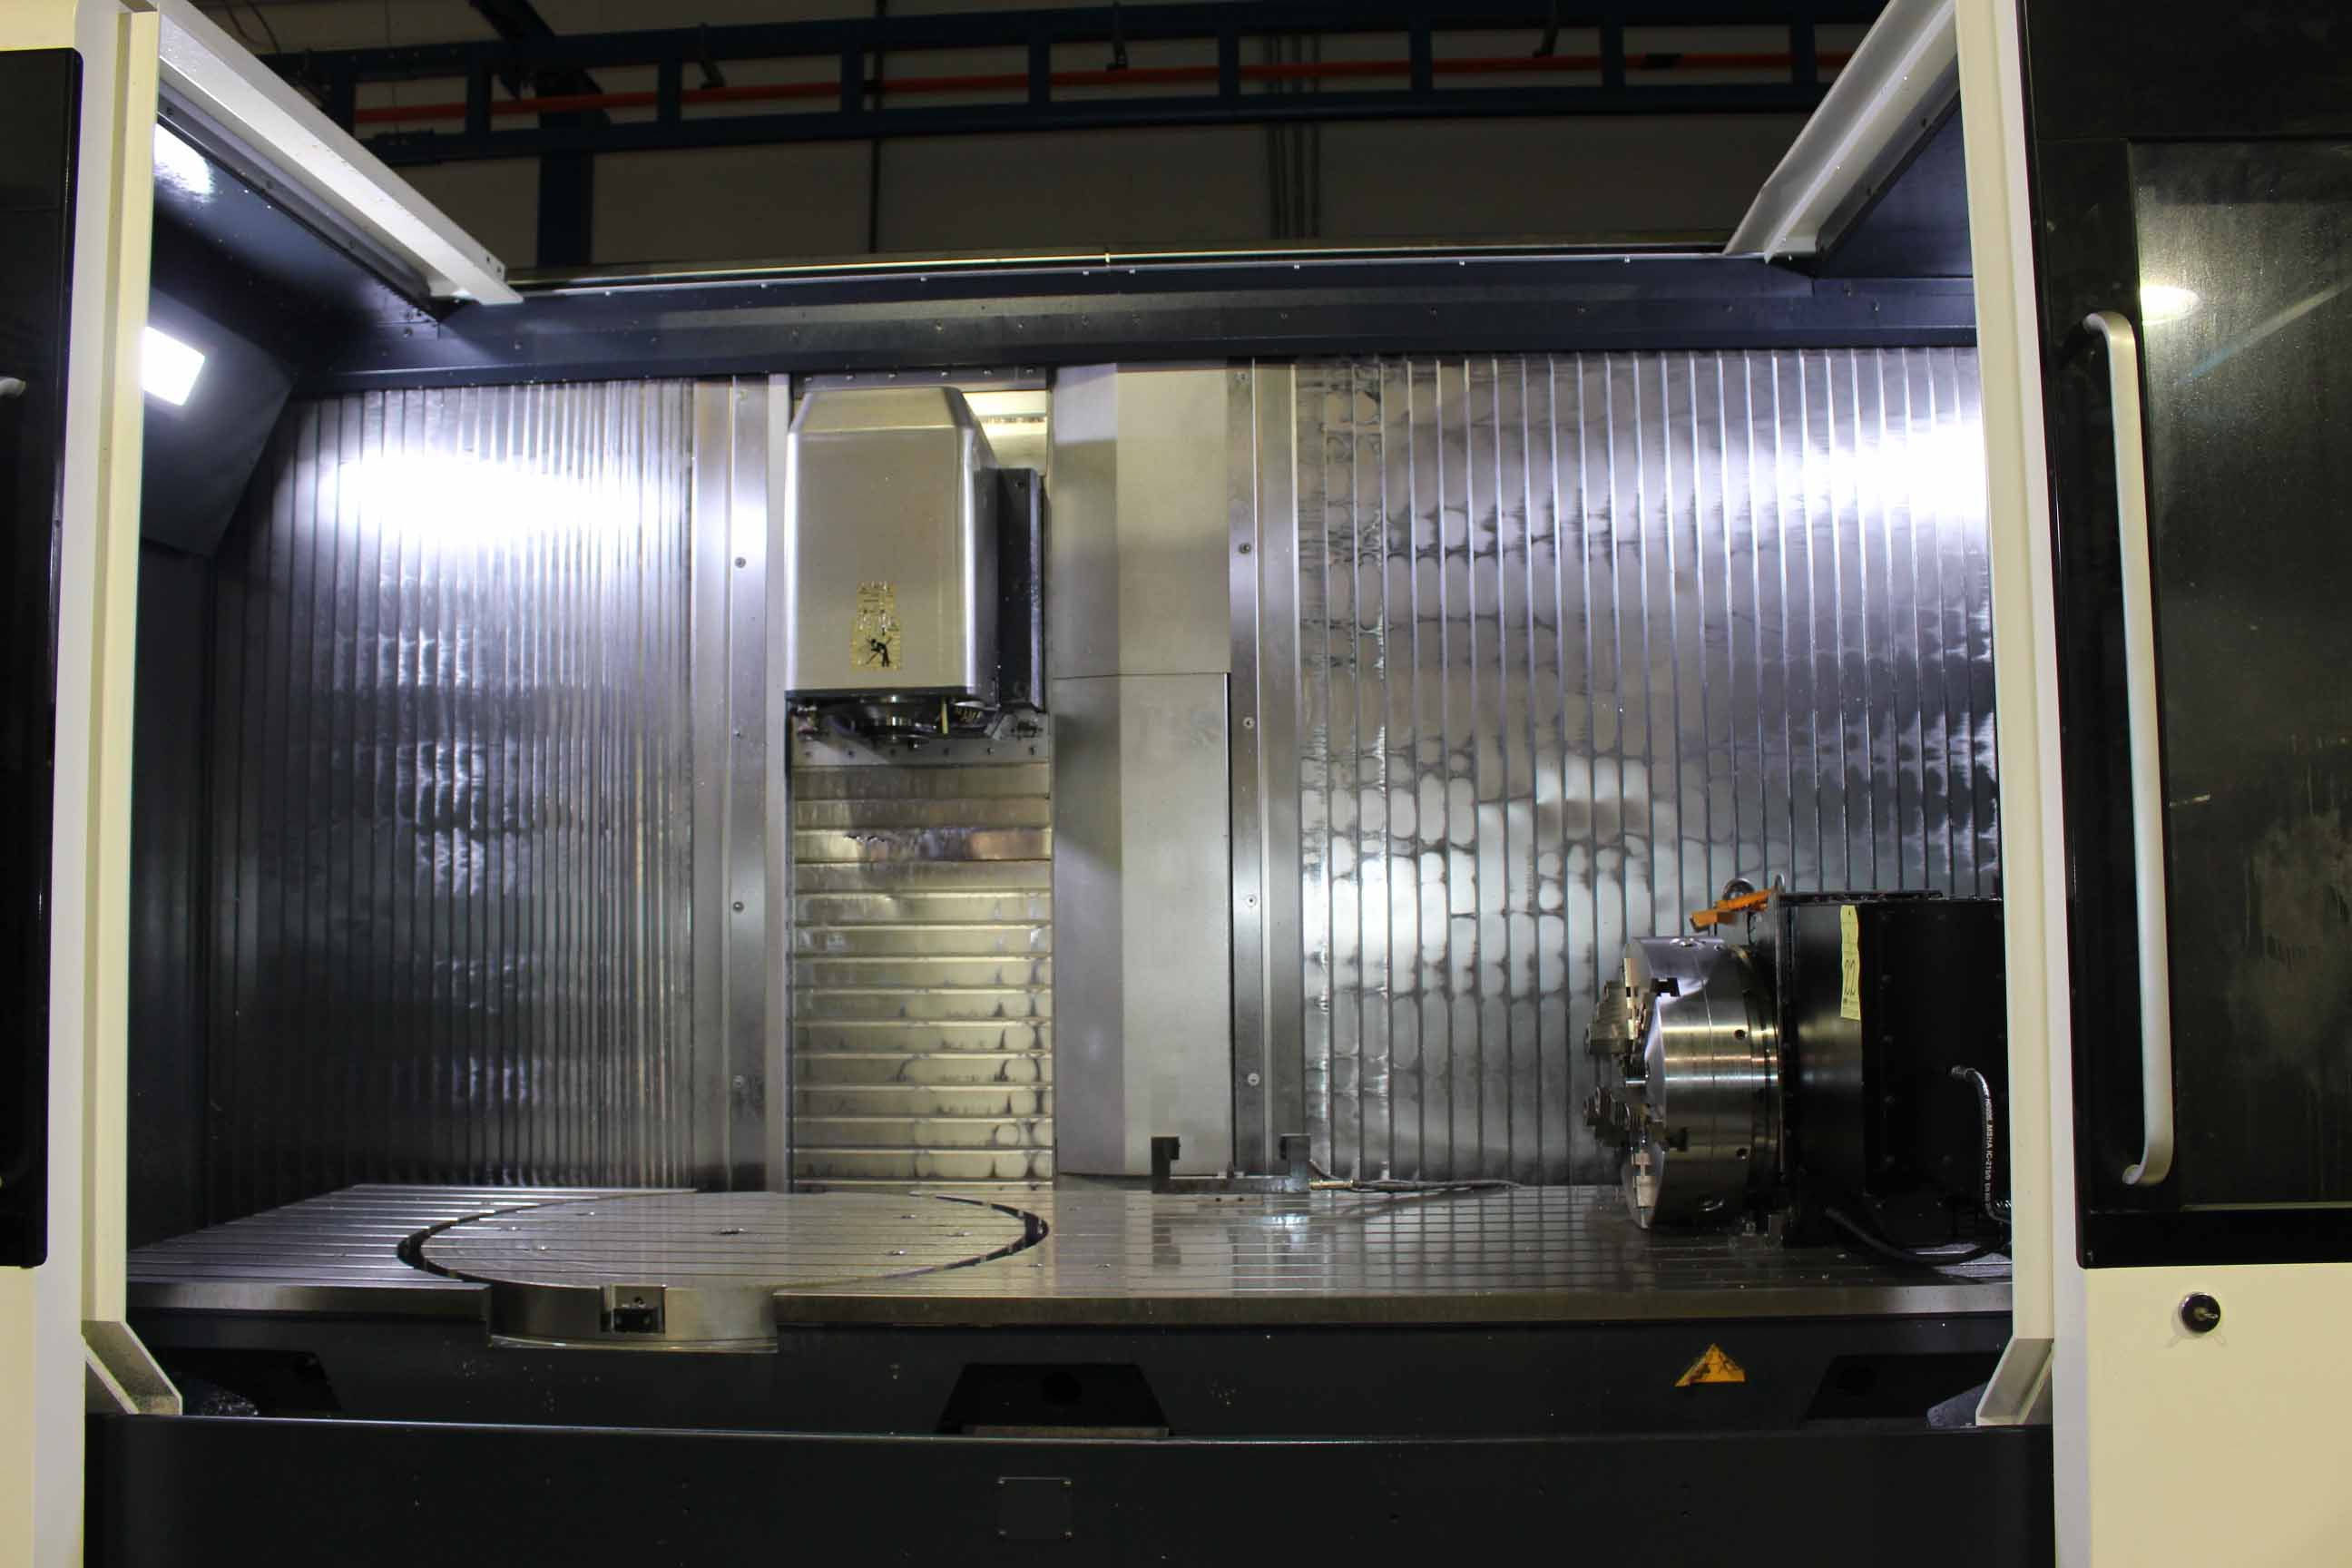 Lot 21 - TRAVELING COLUMN VERTICAL MACHINING CENTER, DECKEL MAHO MDL. DMF260/11, new 2013, Siemens ERGOline